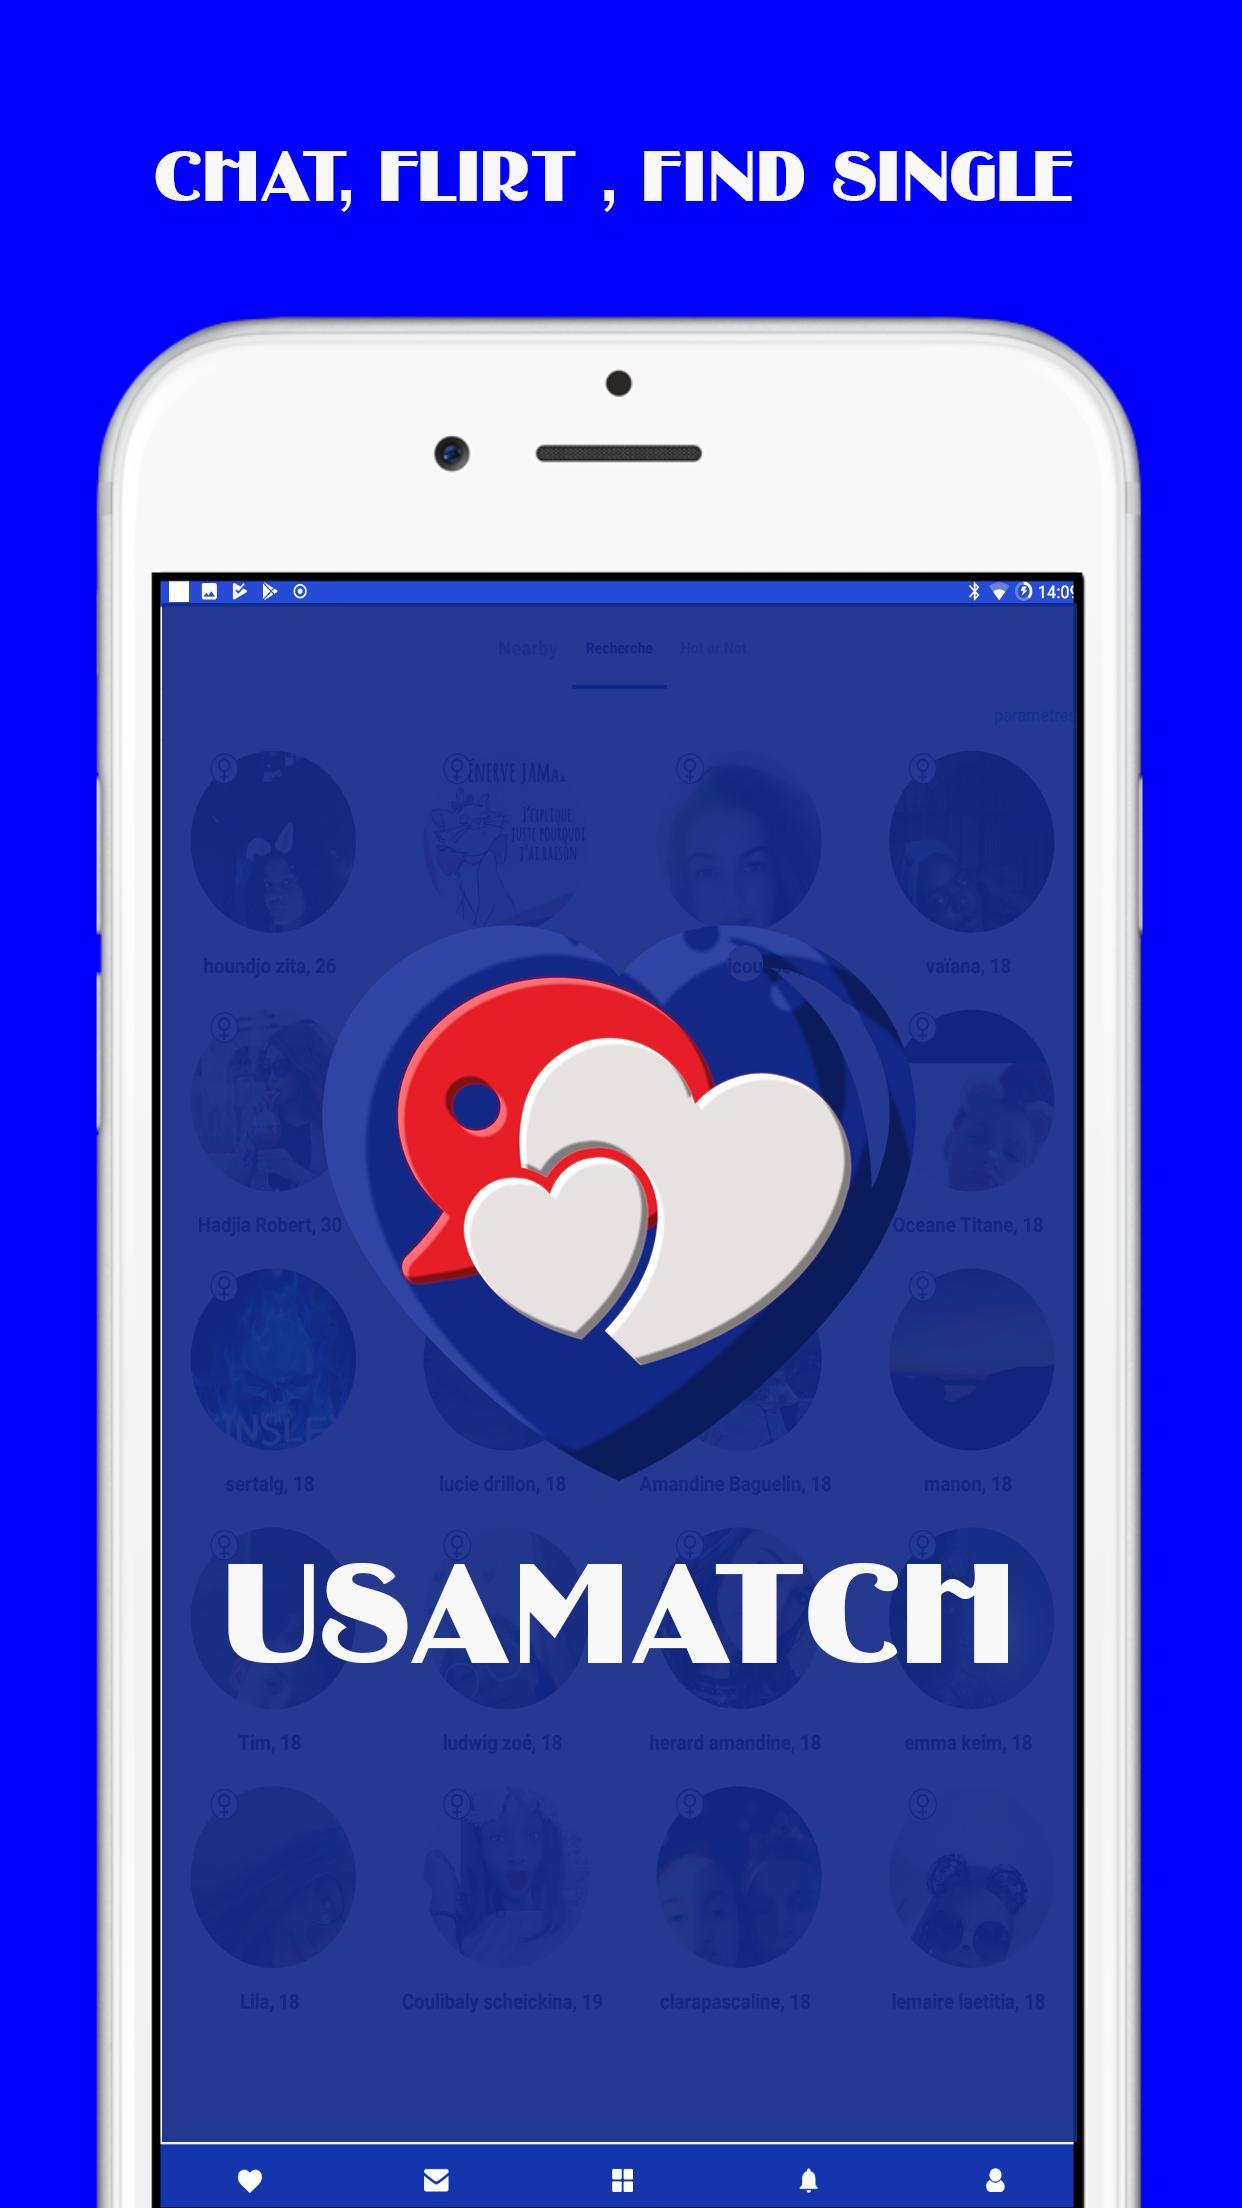 Free free dating singles usa site Mingle2